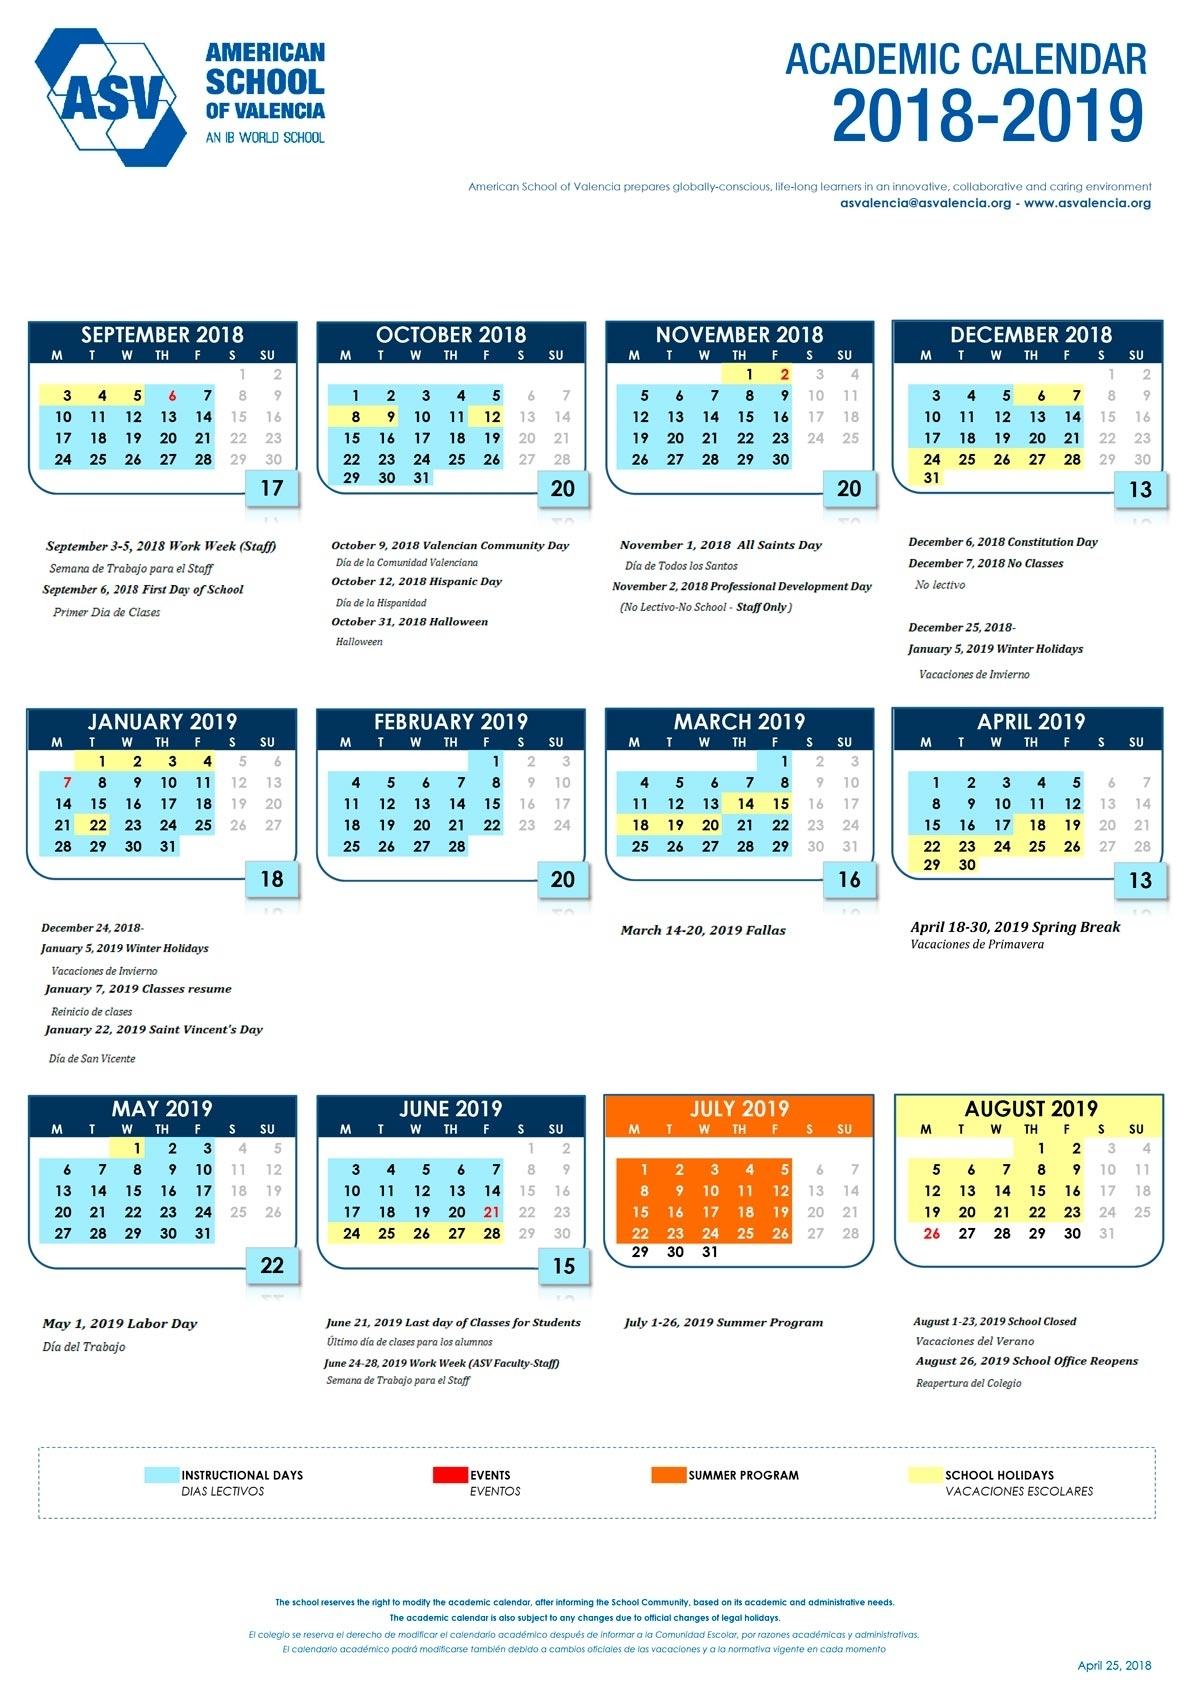 Uc Berkeley Calendar 2020 | Calendar For Planning with regard to Berkeley Academic Calendar